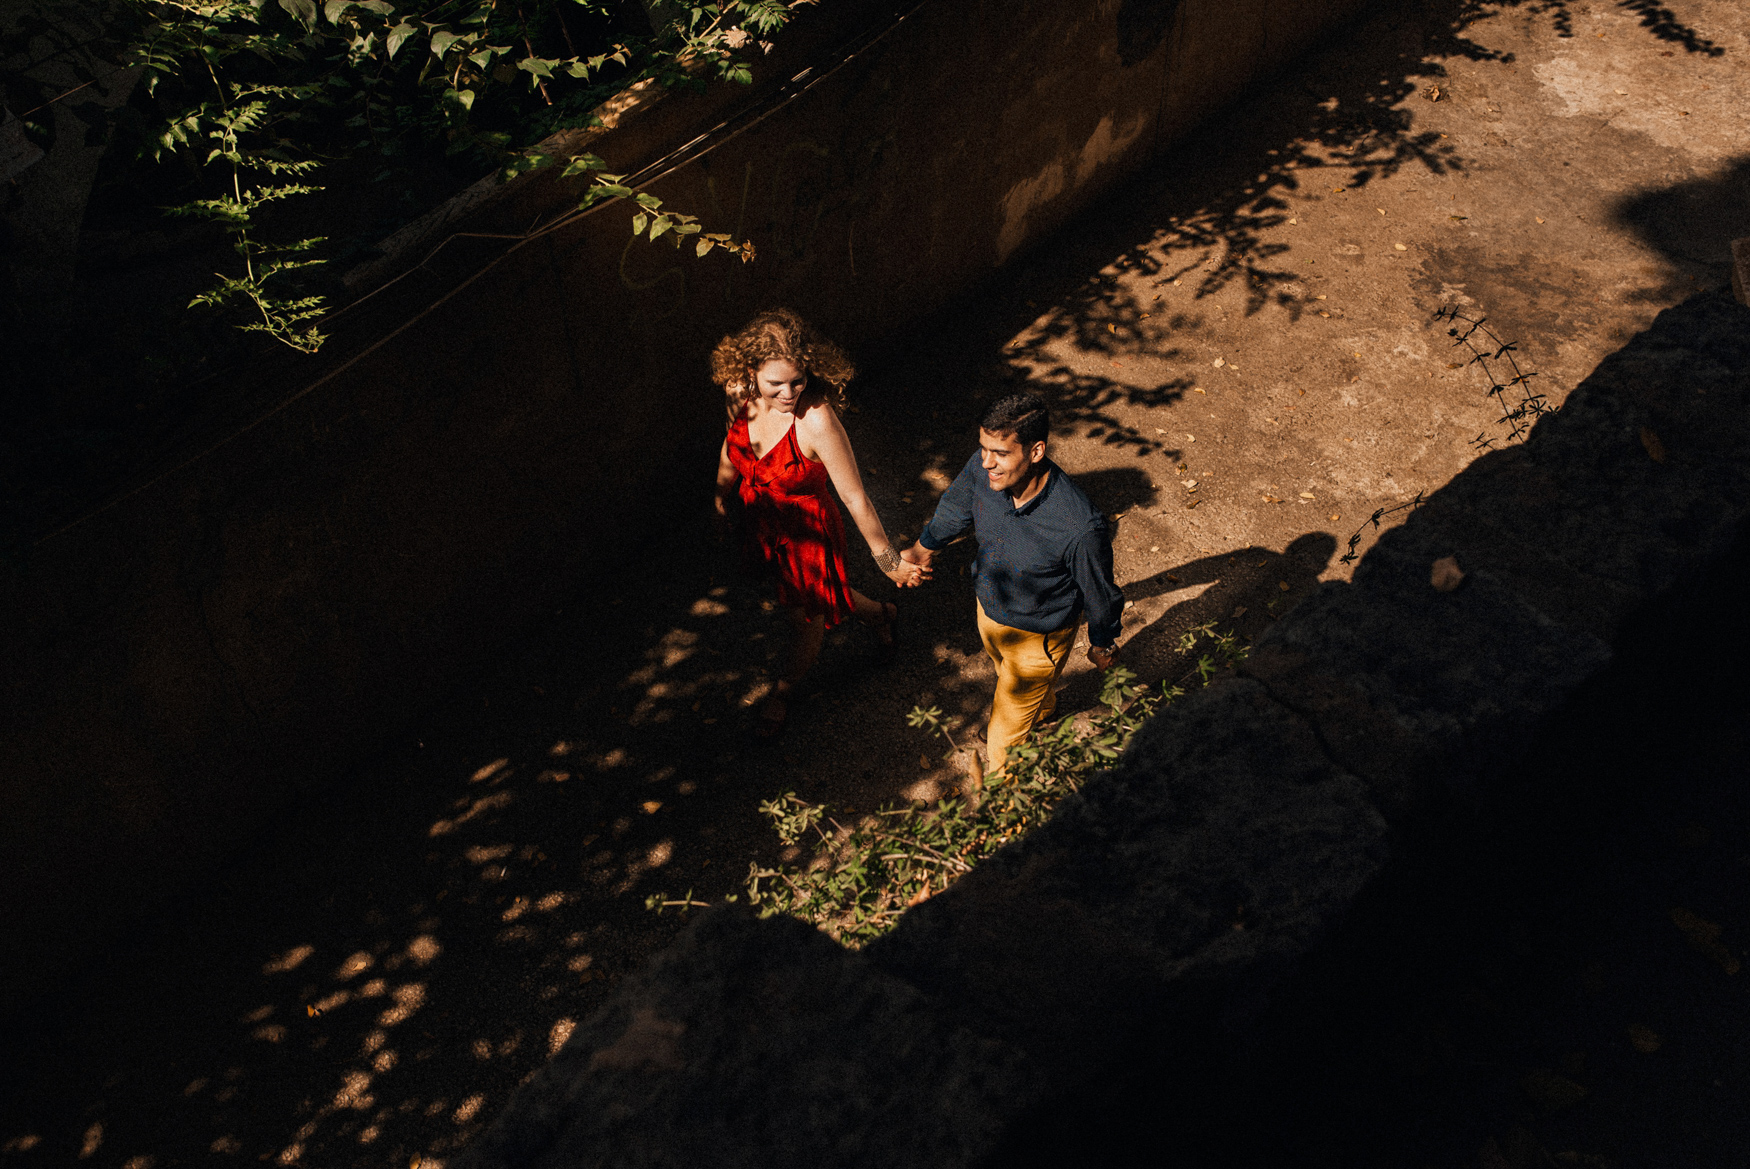 LR1 beirut lebanon mar mikhael wedding photographer 006.jpg